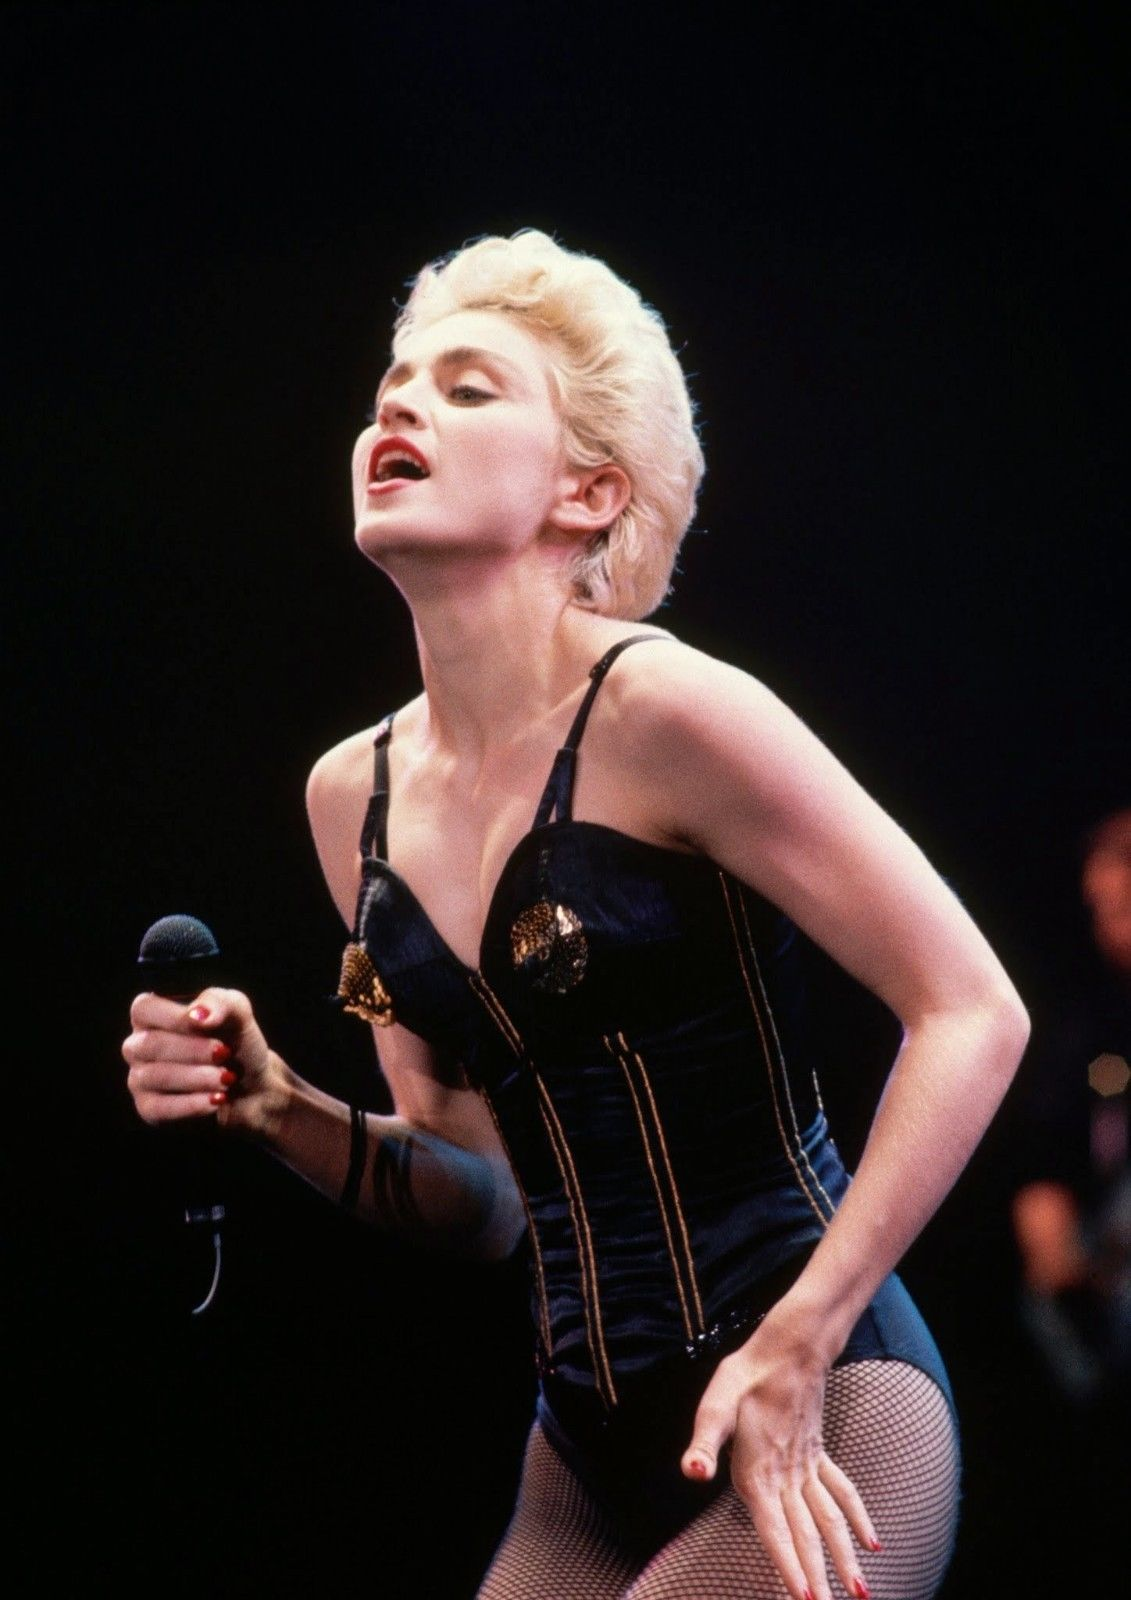 CANVAS Madonna Singing in Concert Art print POSTER